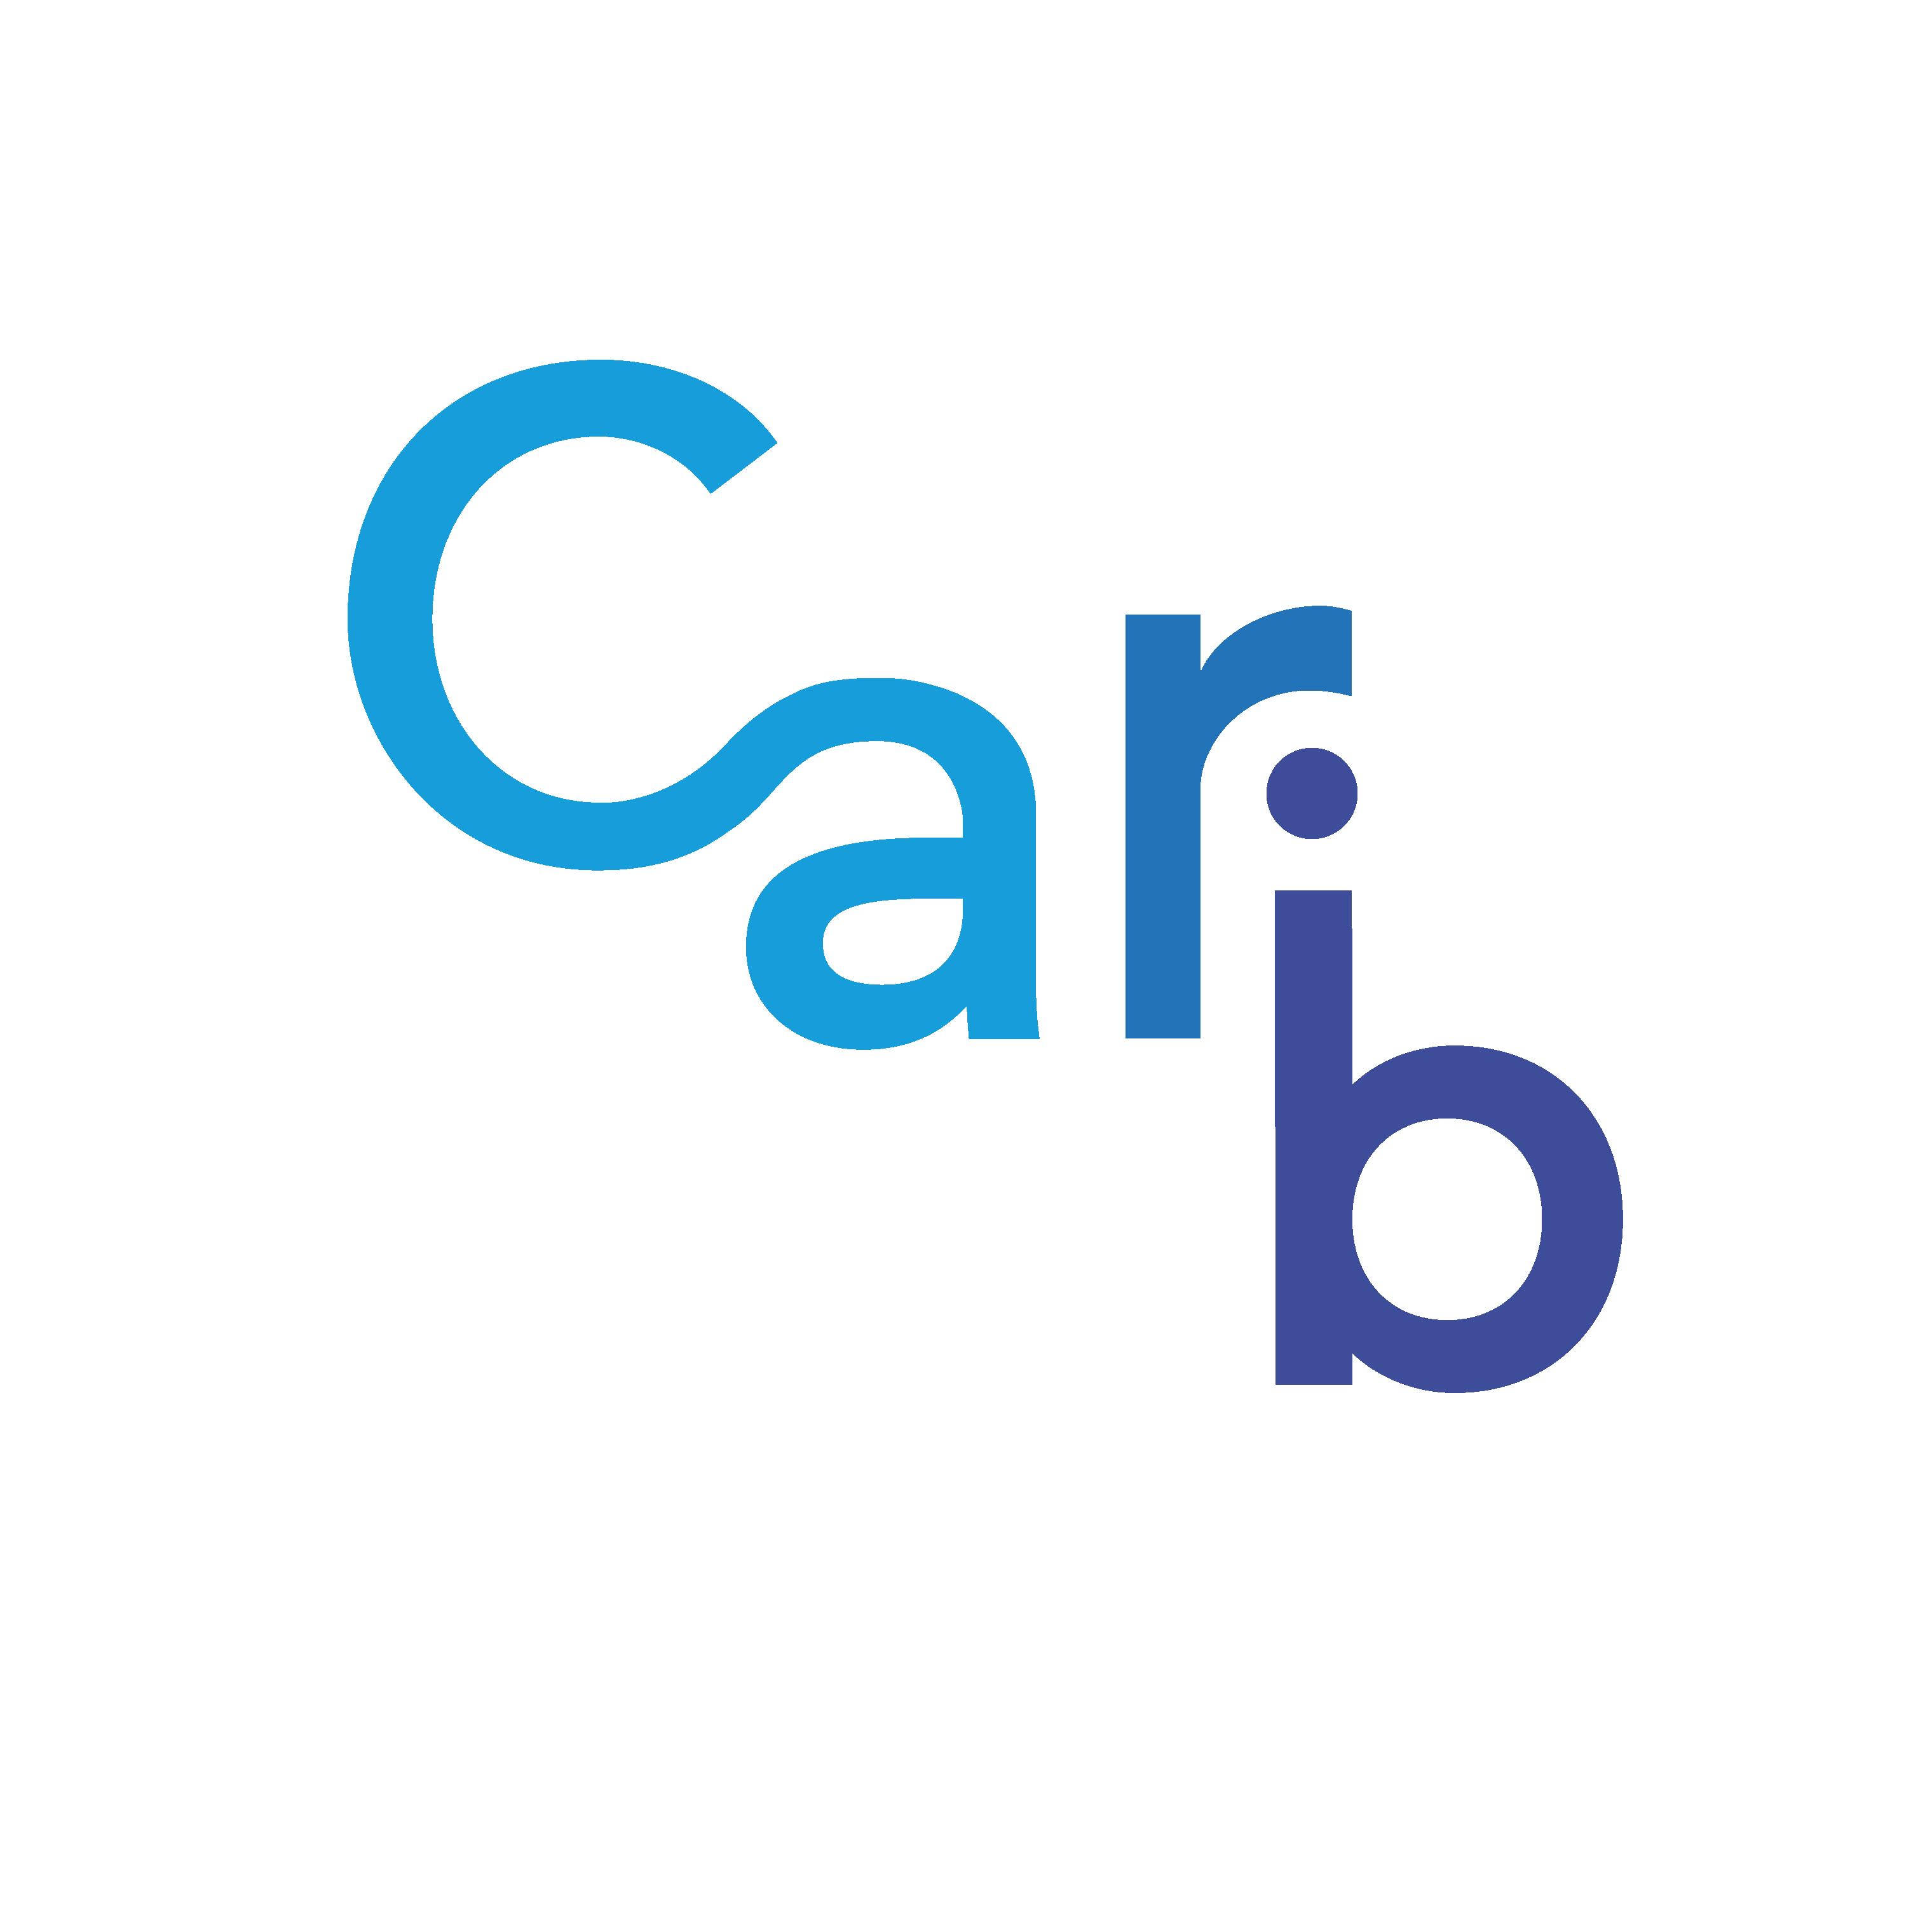 Caribexpo conférences